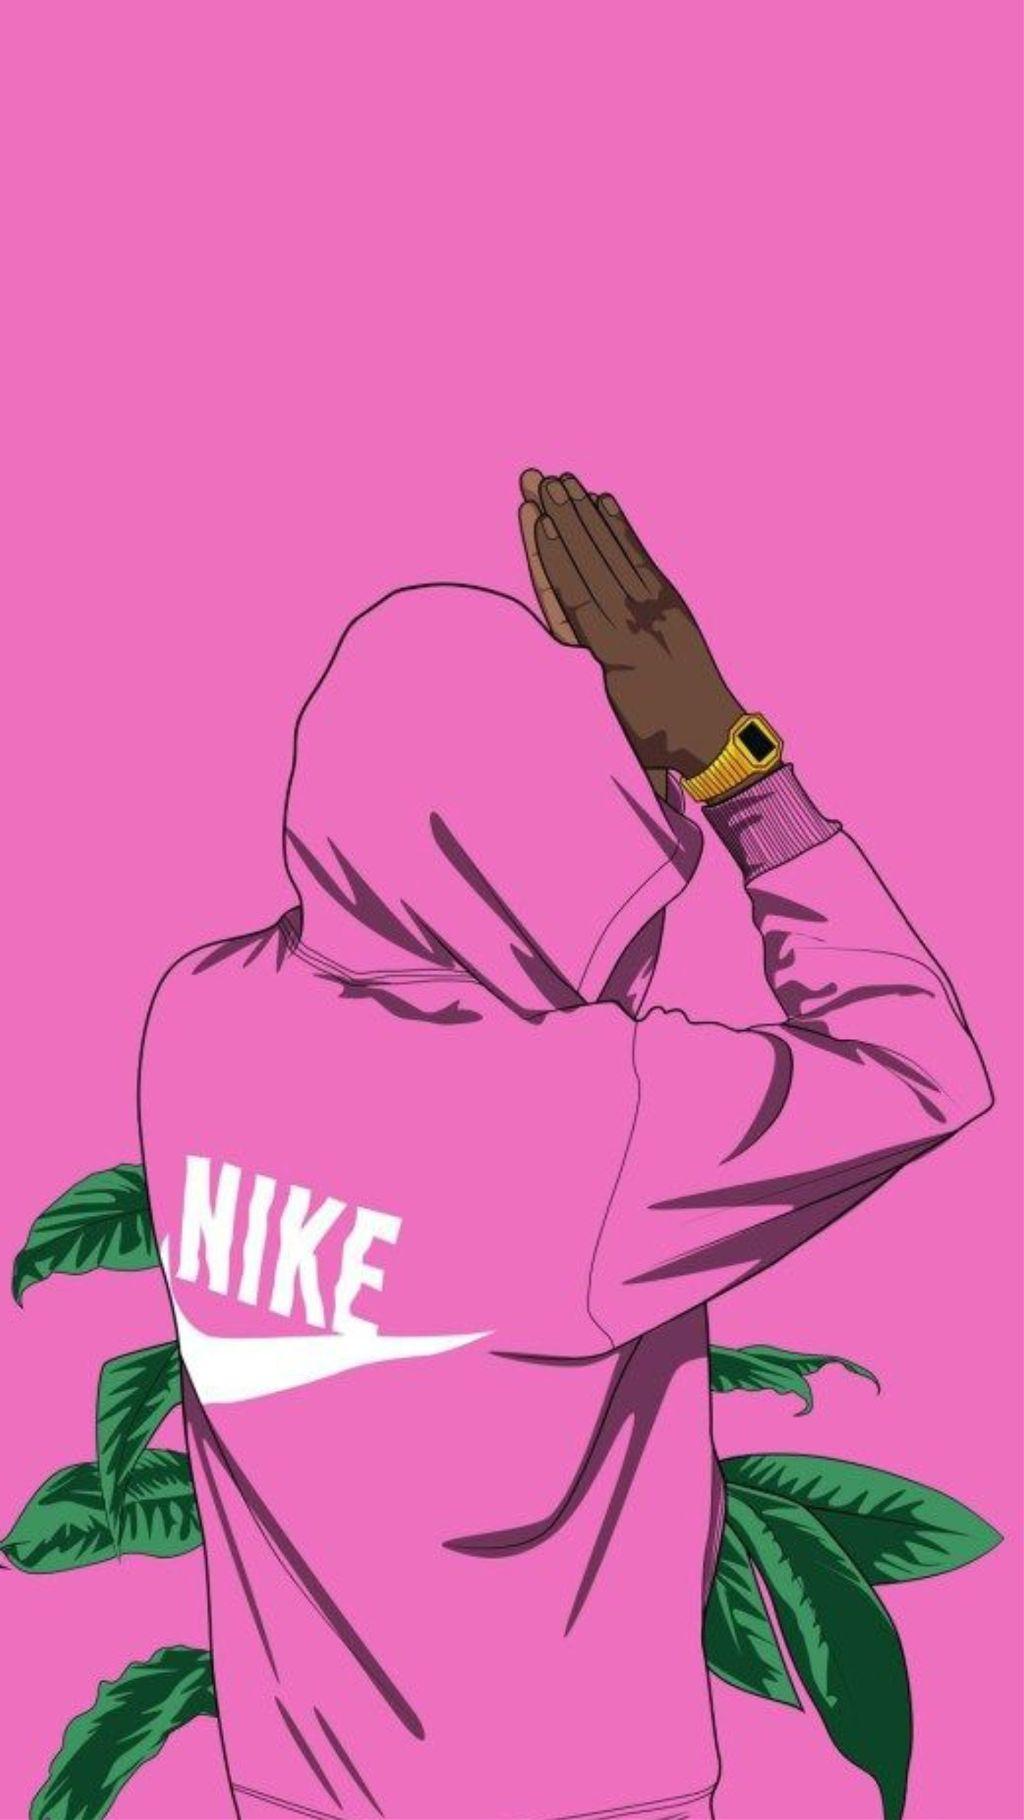 Wallpaper Nike Pink Boy Drawings Wallpapers